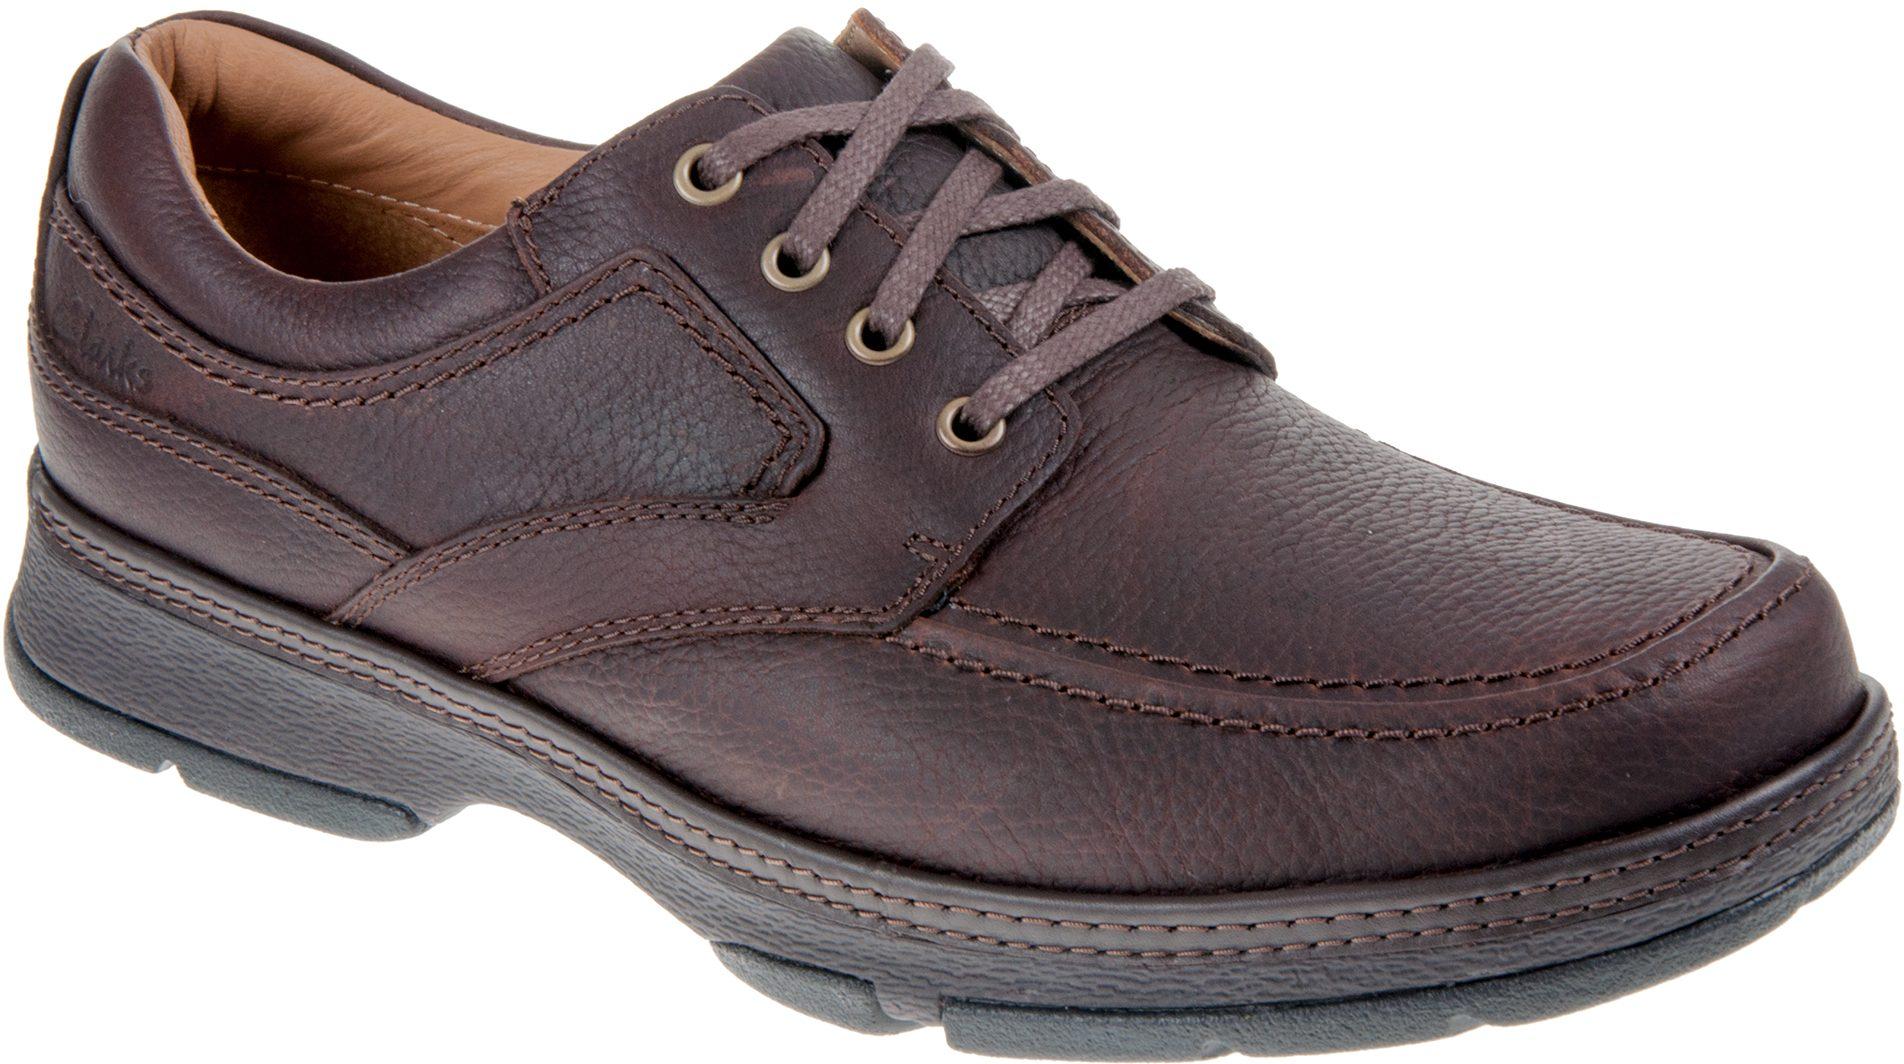 dd8250cc5b8e9 Clarks Star Stride Brown 20325620 - Casual Shoes - Humphries Shoes